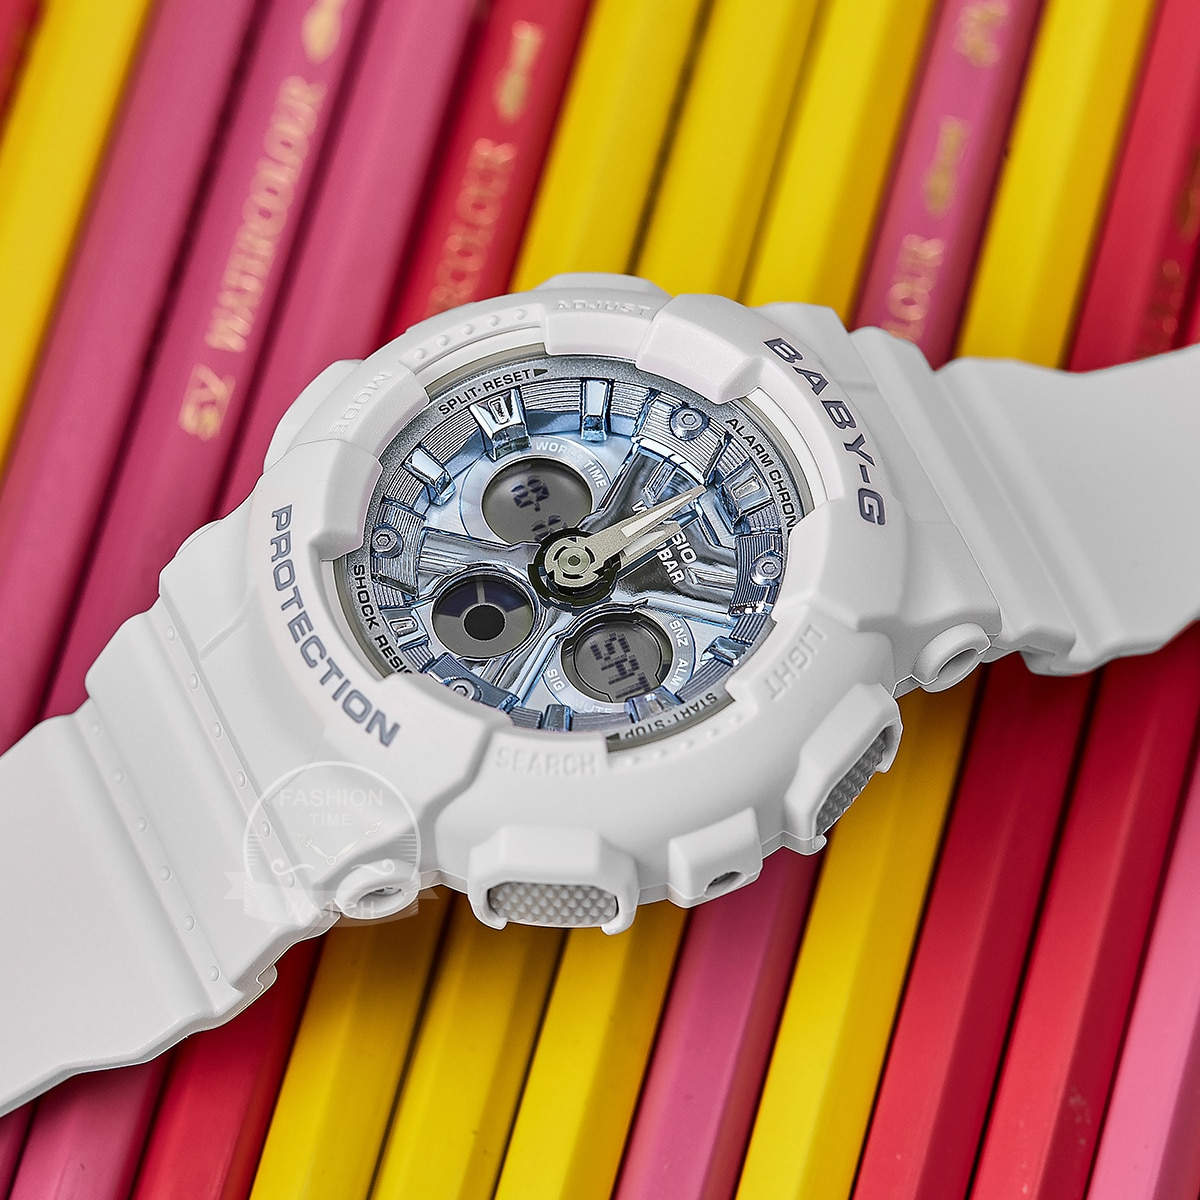 Casio watch baby-g women watches set luxury brand ladies watch 100m Waterproof LED clocks digital Quartz sport watch womenBA-130 enlarge